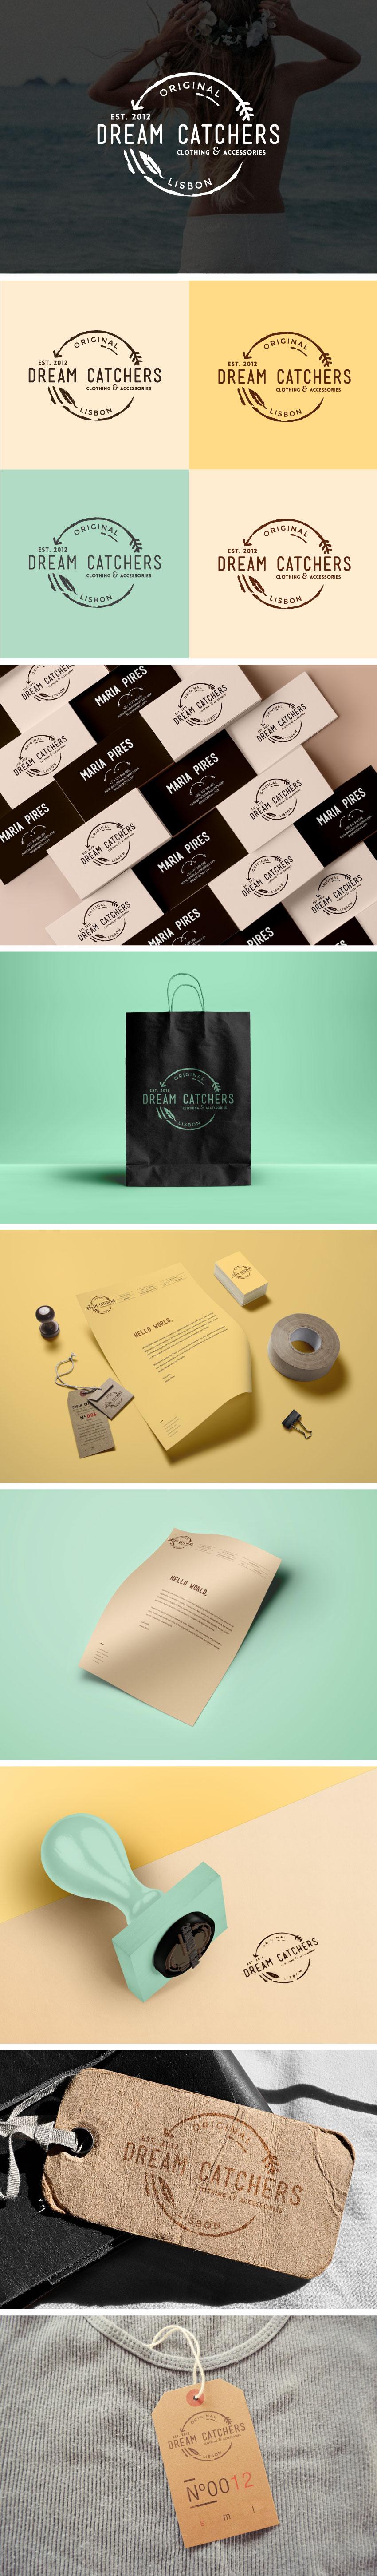 Visual Identity for Dream Catchers by Yana K